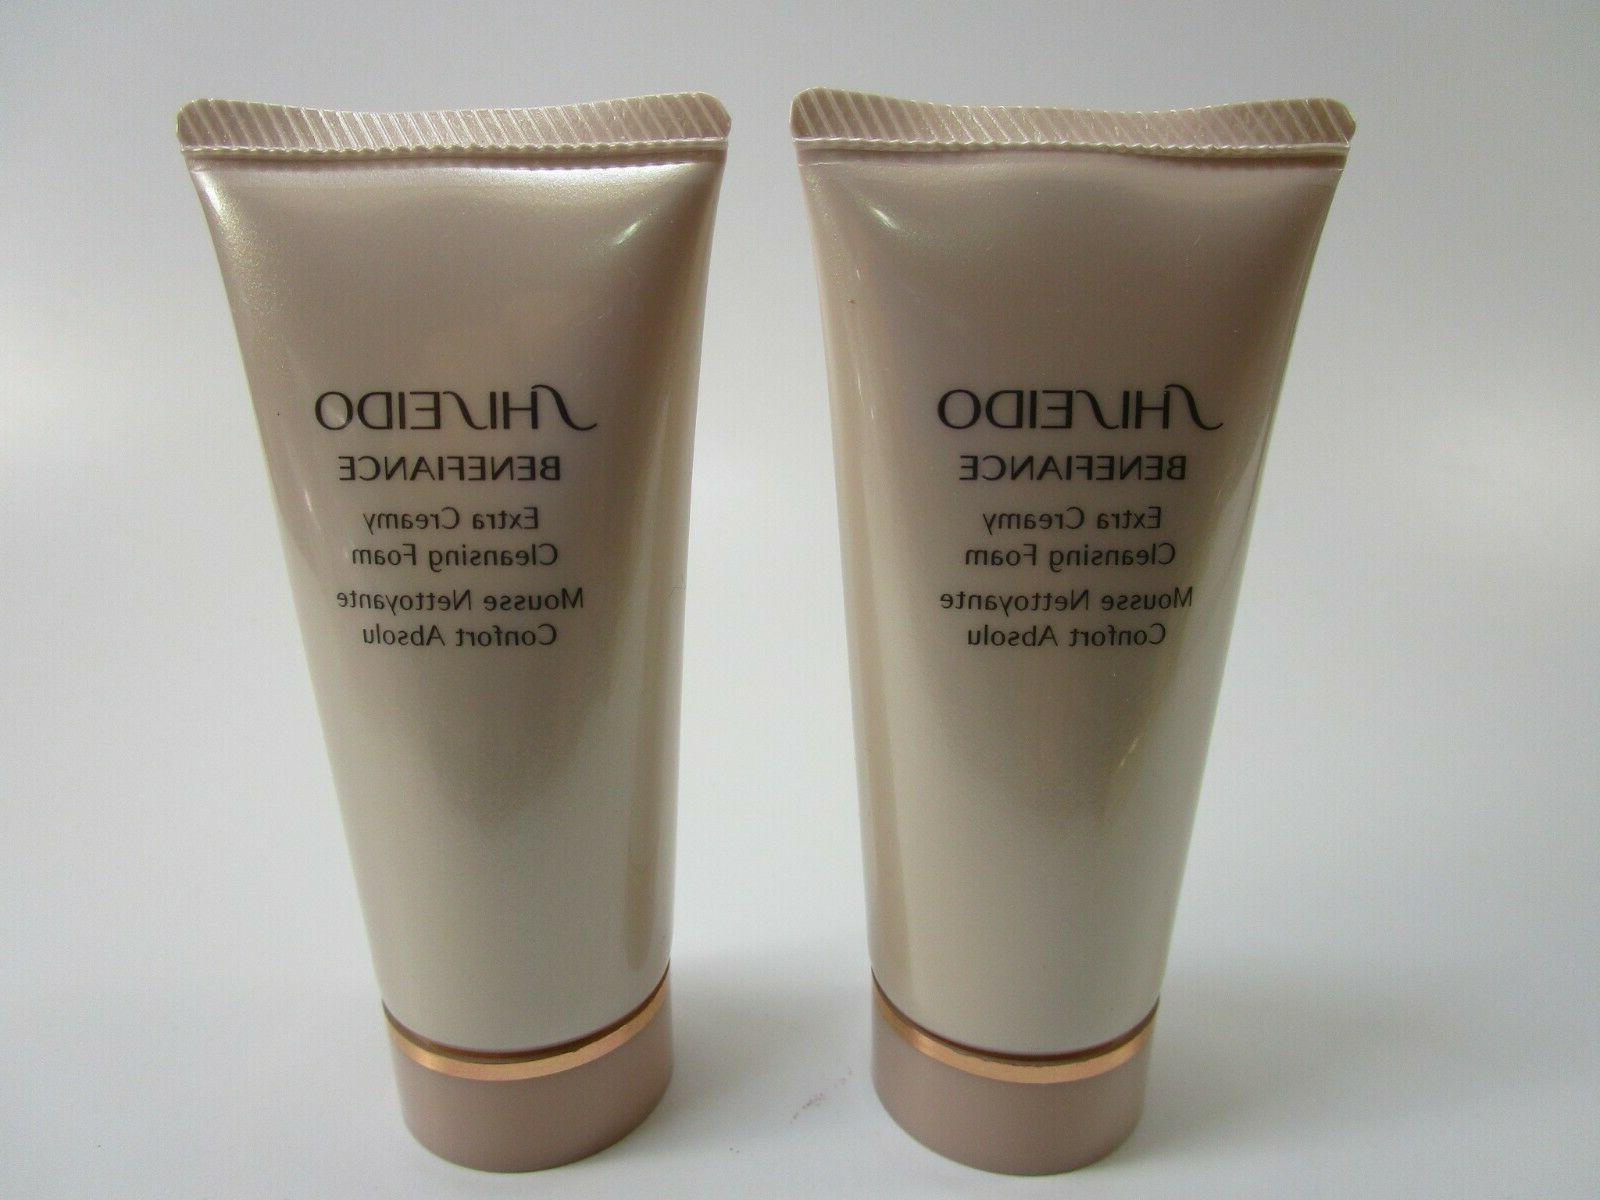 2 shiseido benefiance extra creamy cleansing foam